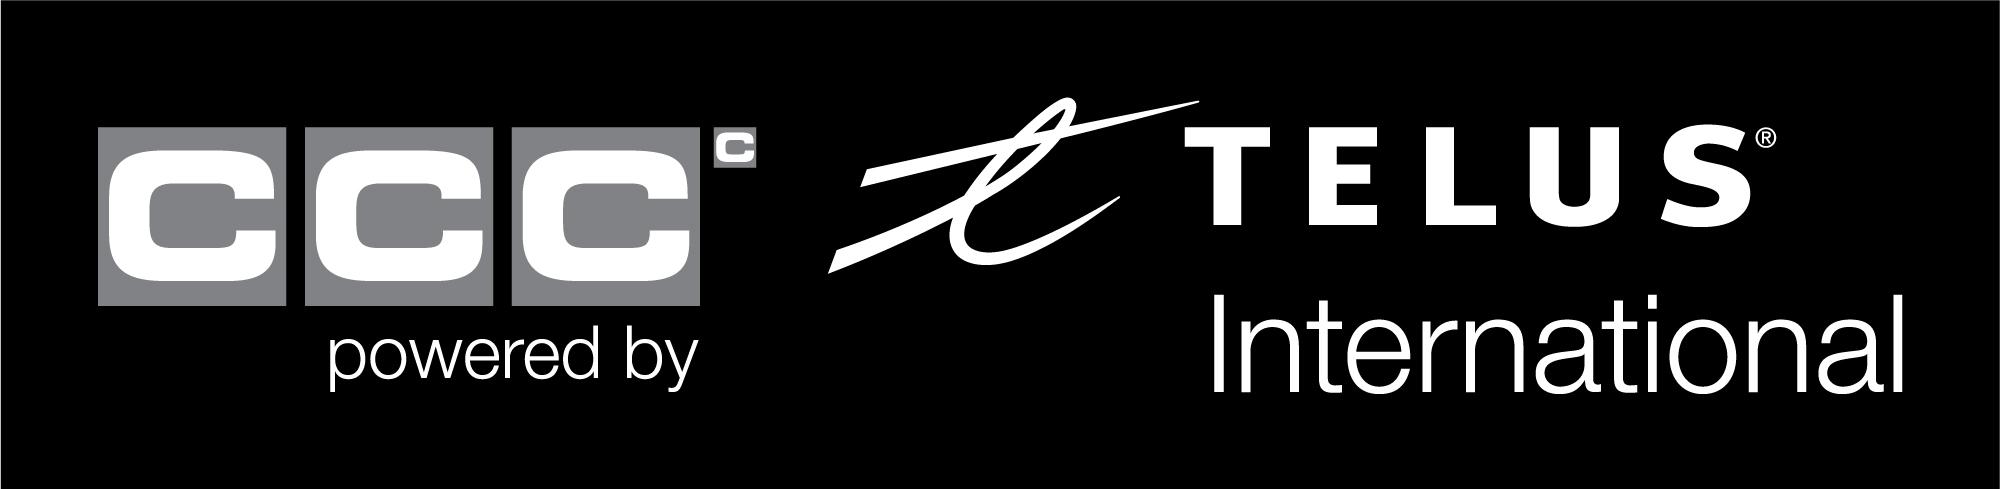 Logo čierne pozadie